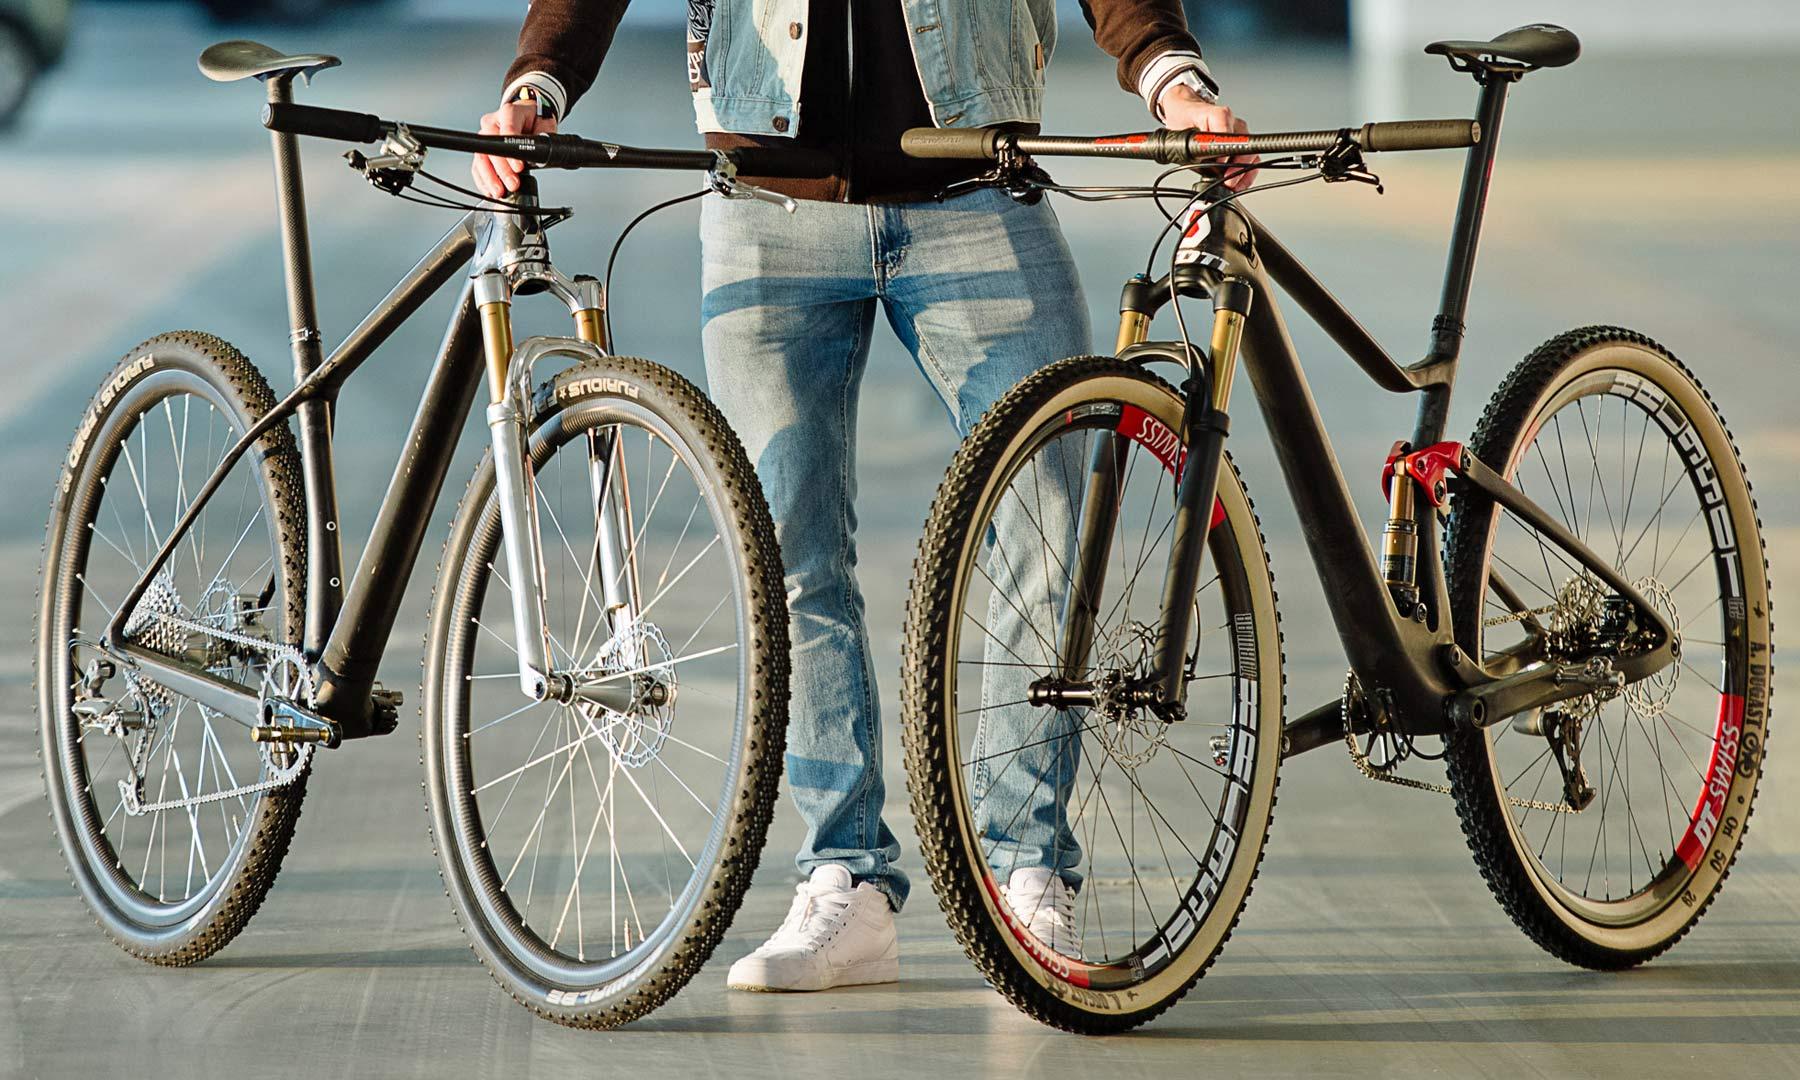 d476e6547 BFS2018  The world s lightest 29er mountain bikes are a Scott Scale   Spark